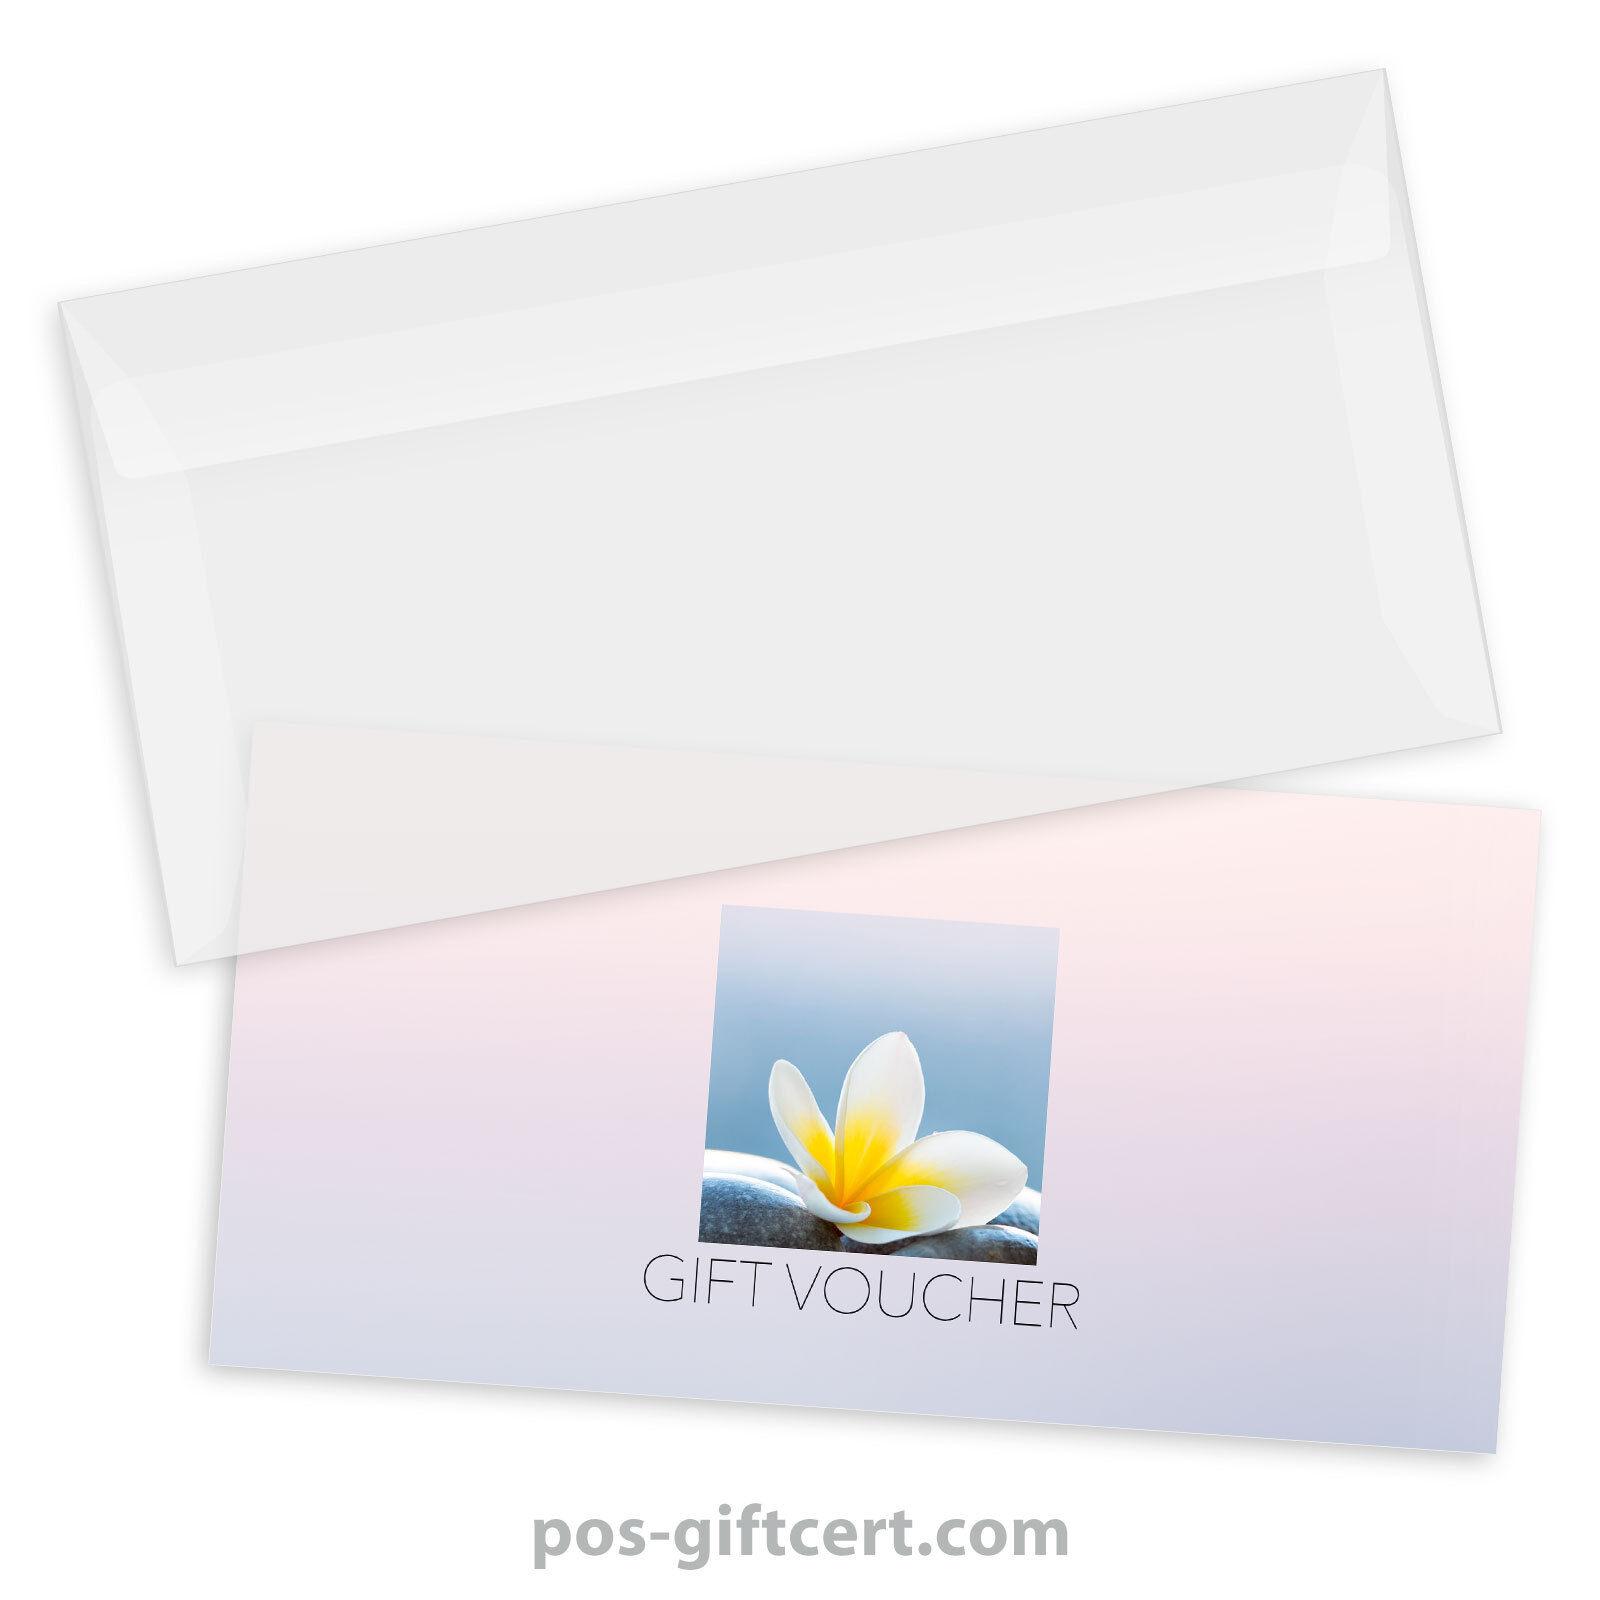 Gift vouchers  envelopes for physiotherapy, massage, wellness, spa MA9250GB | Klein und fein  | Zarte